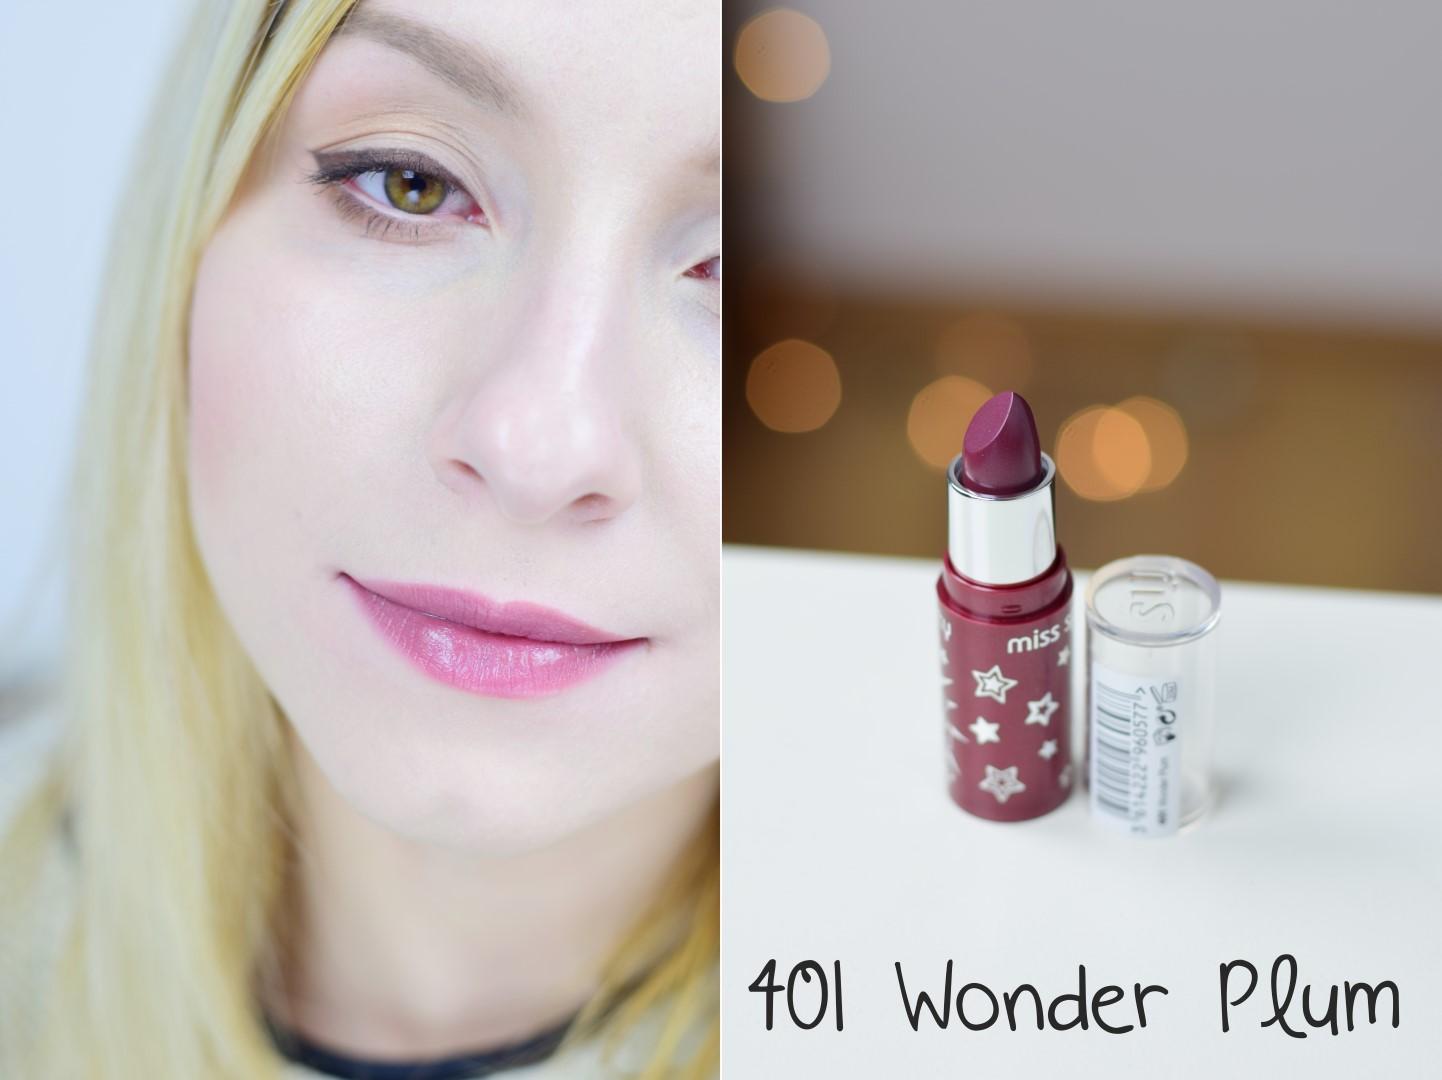 miss_sporty_wonder_smooth_blog_opinia_recenzja_swatche_wonder_plum_401